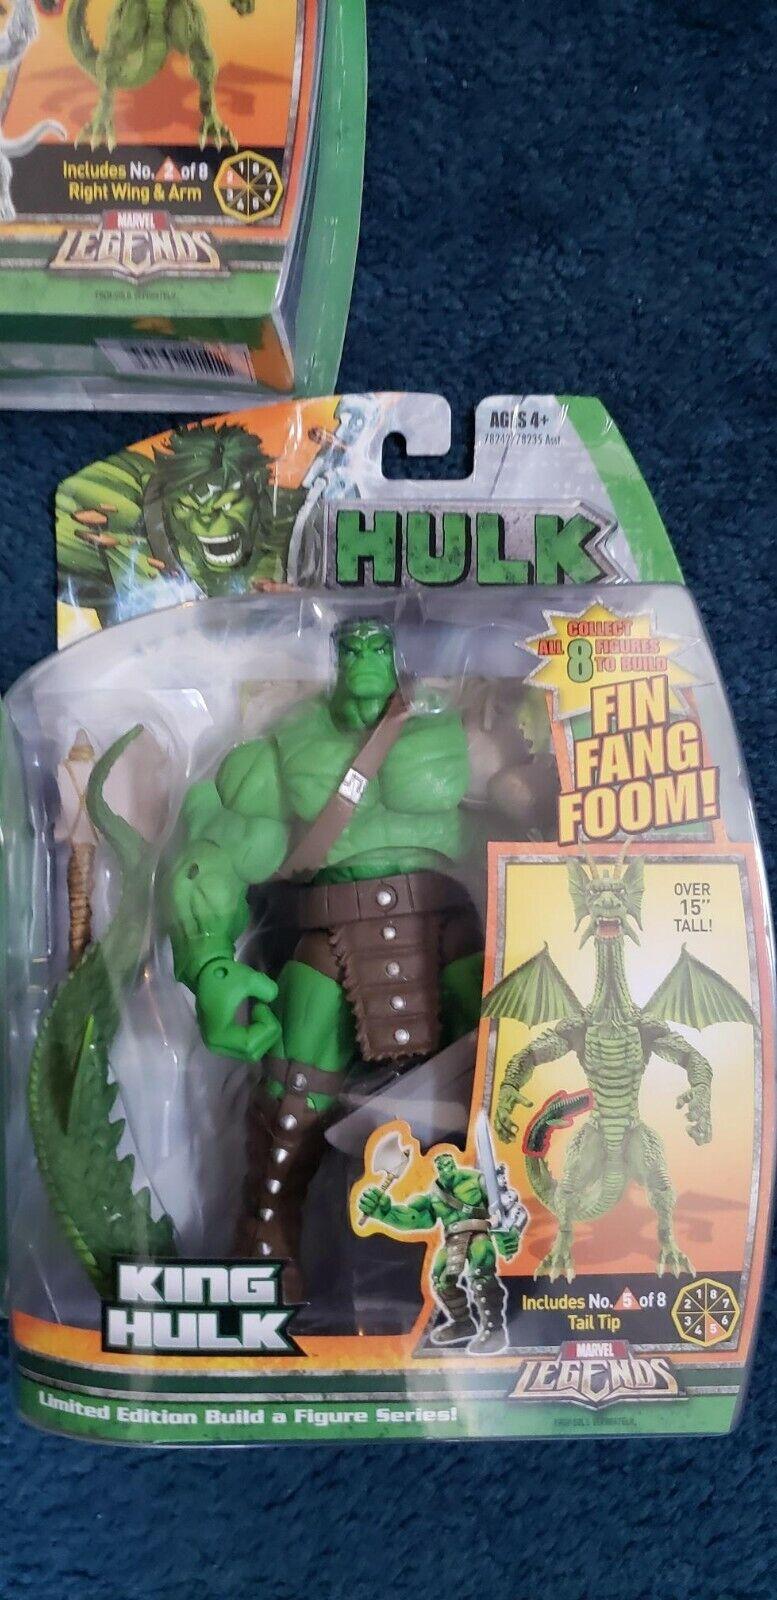 Marvel leggendeclasseic HulkFIN FANG presero BAF HULK SERIE cifra SIGILLATO